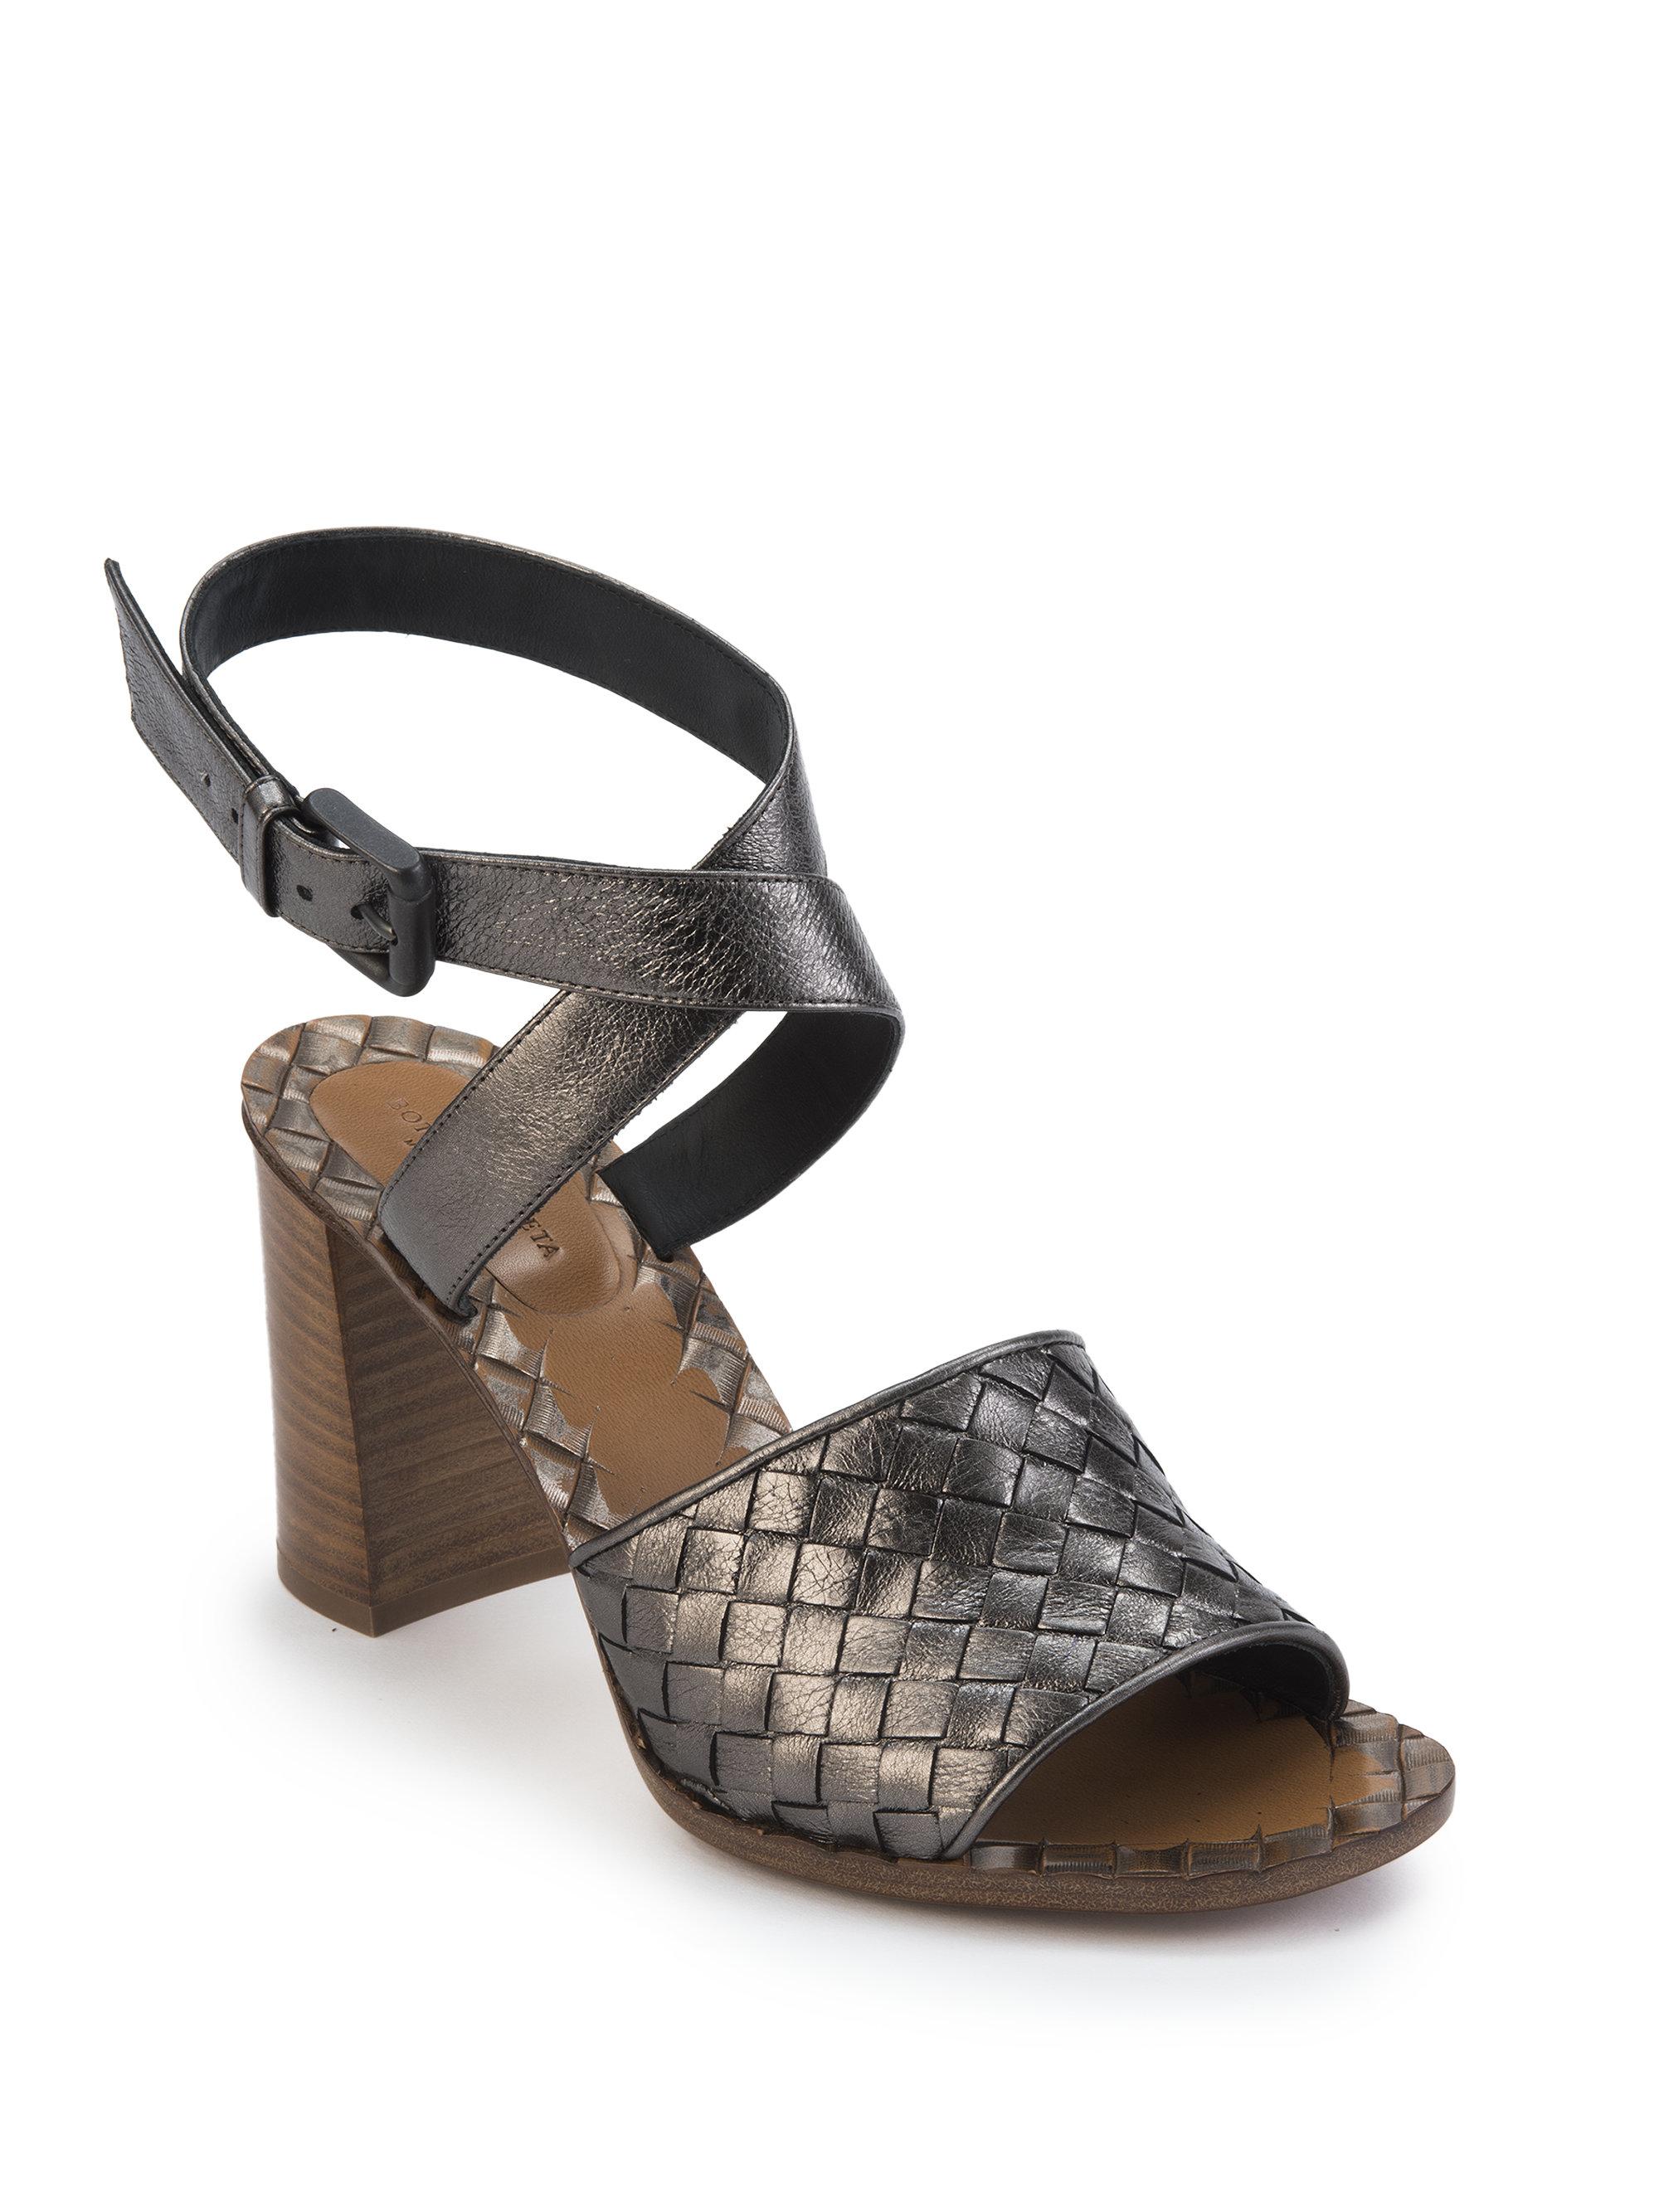 Bottega Veneta Intrecciato heeled sandals FQNtm1BPjW